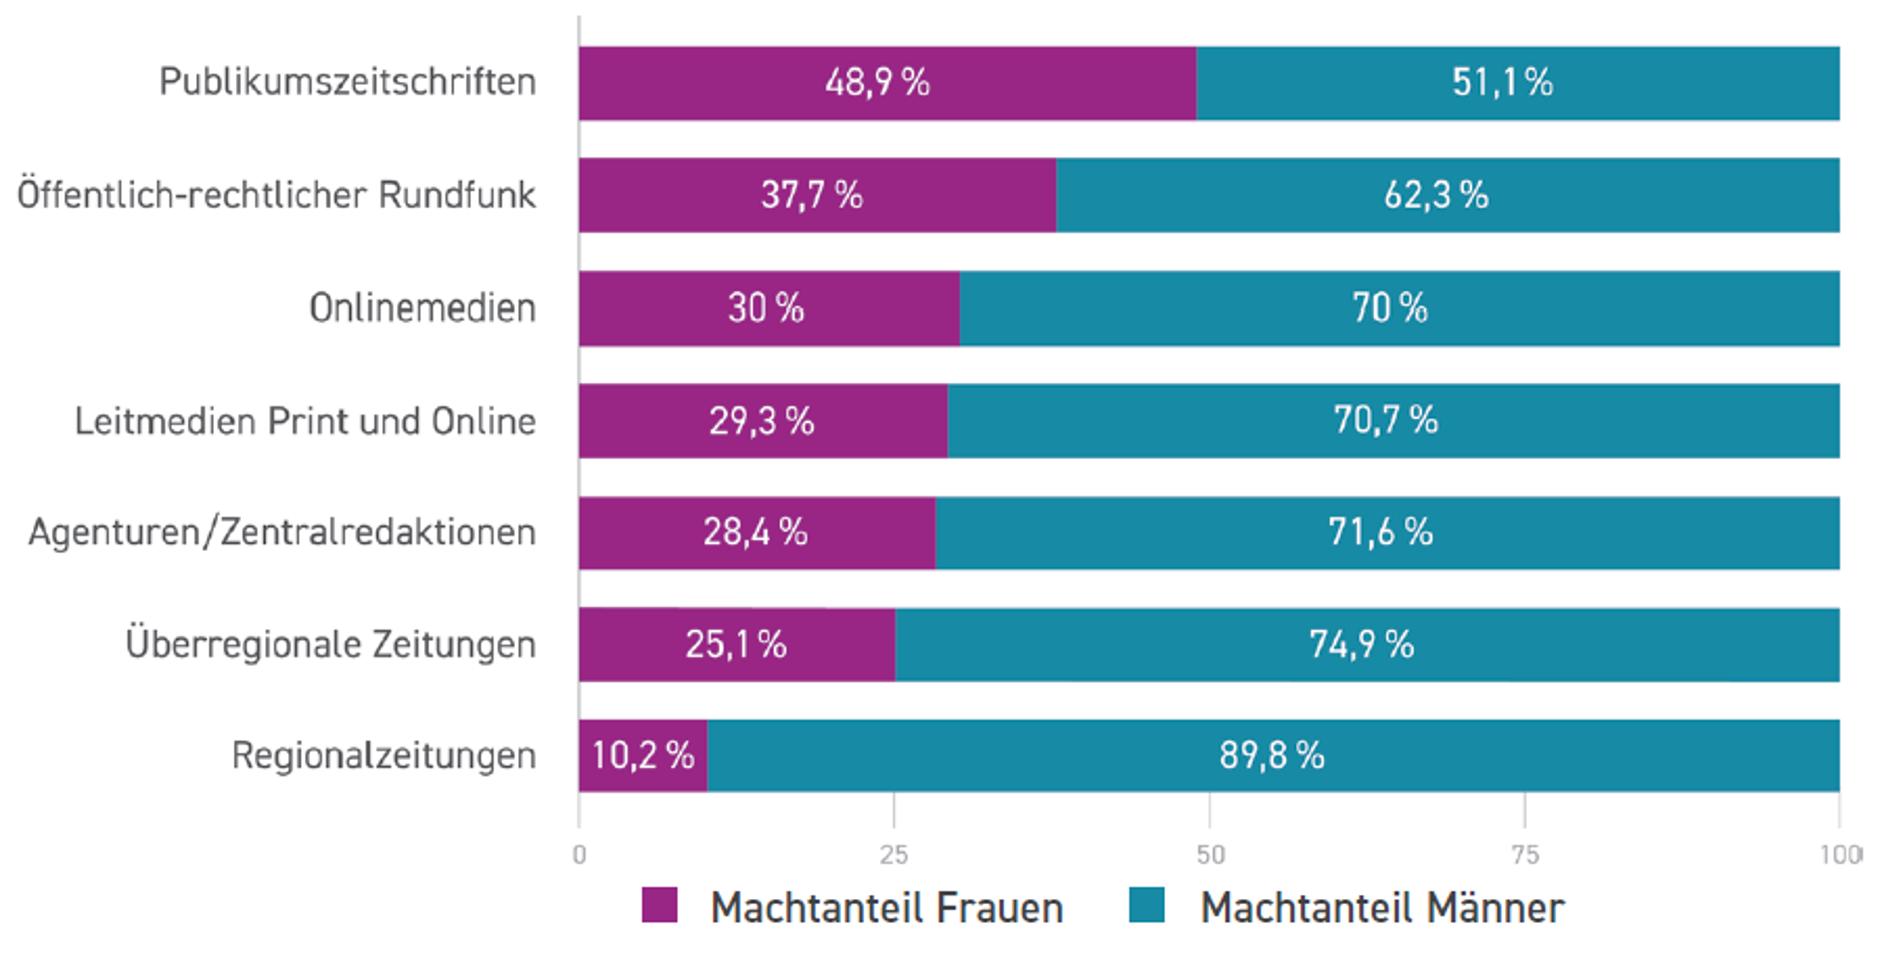 women power factor in German media